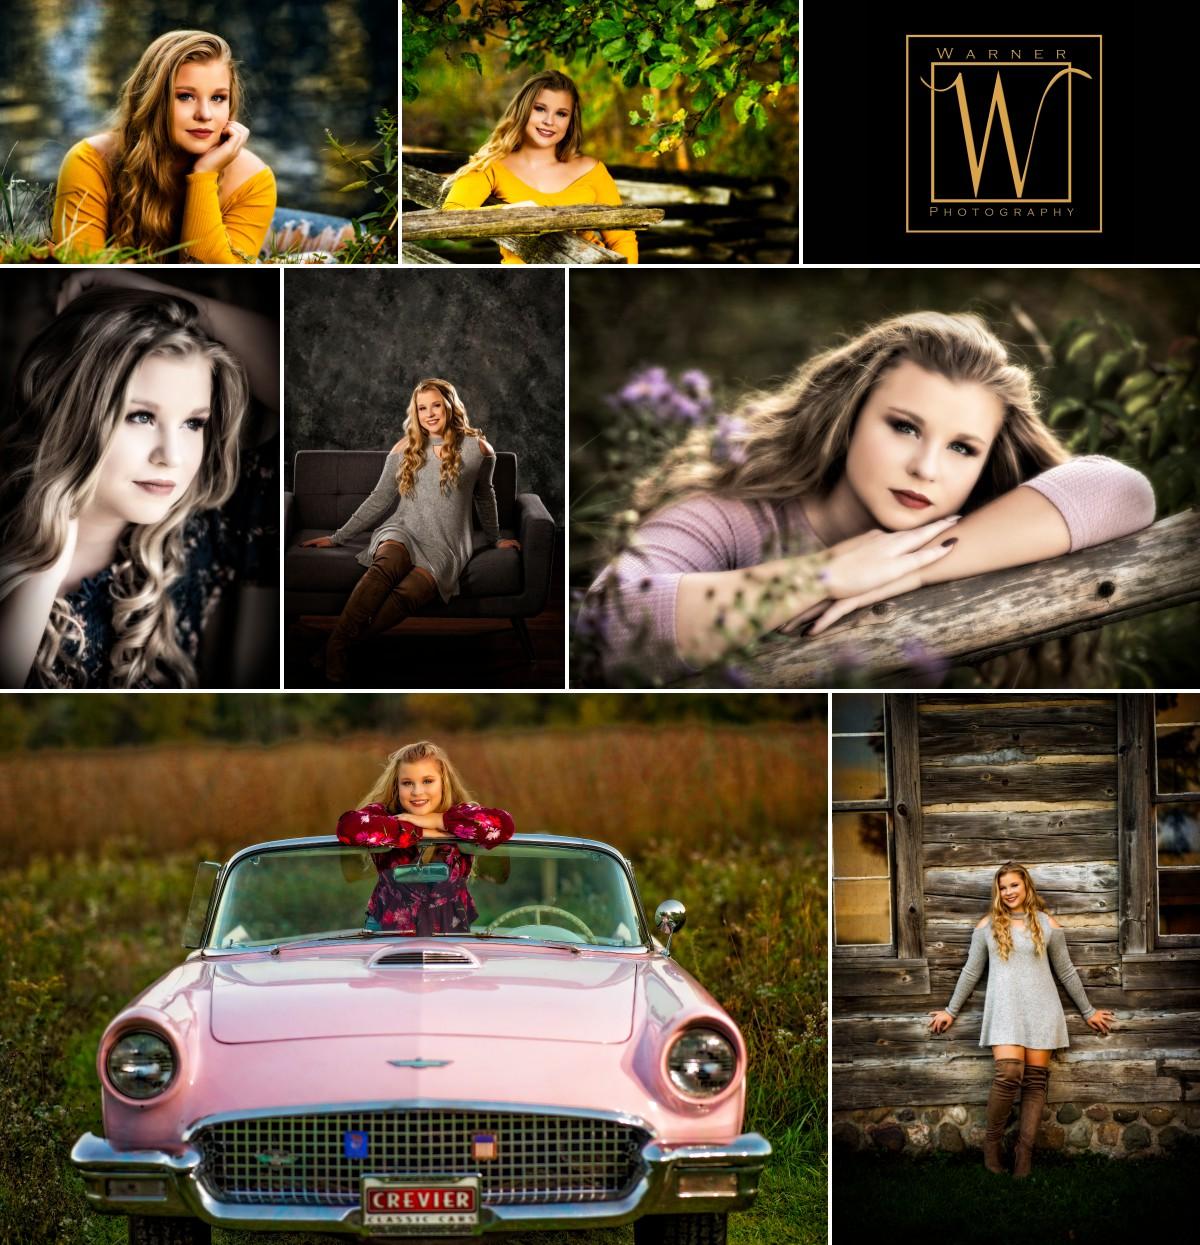 senior portrait collage of Dow High senior Sydney Chippewa Nature Center studio indoor outdoor pink car